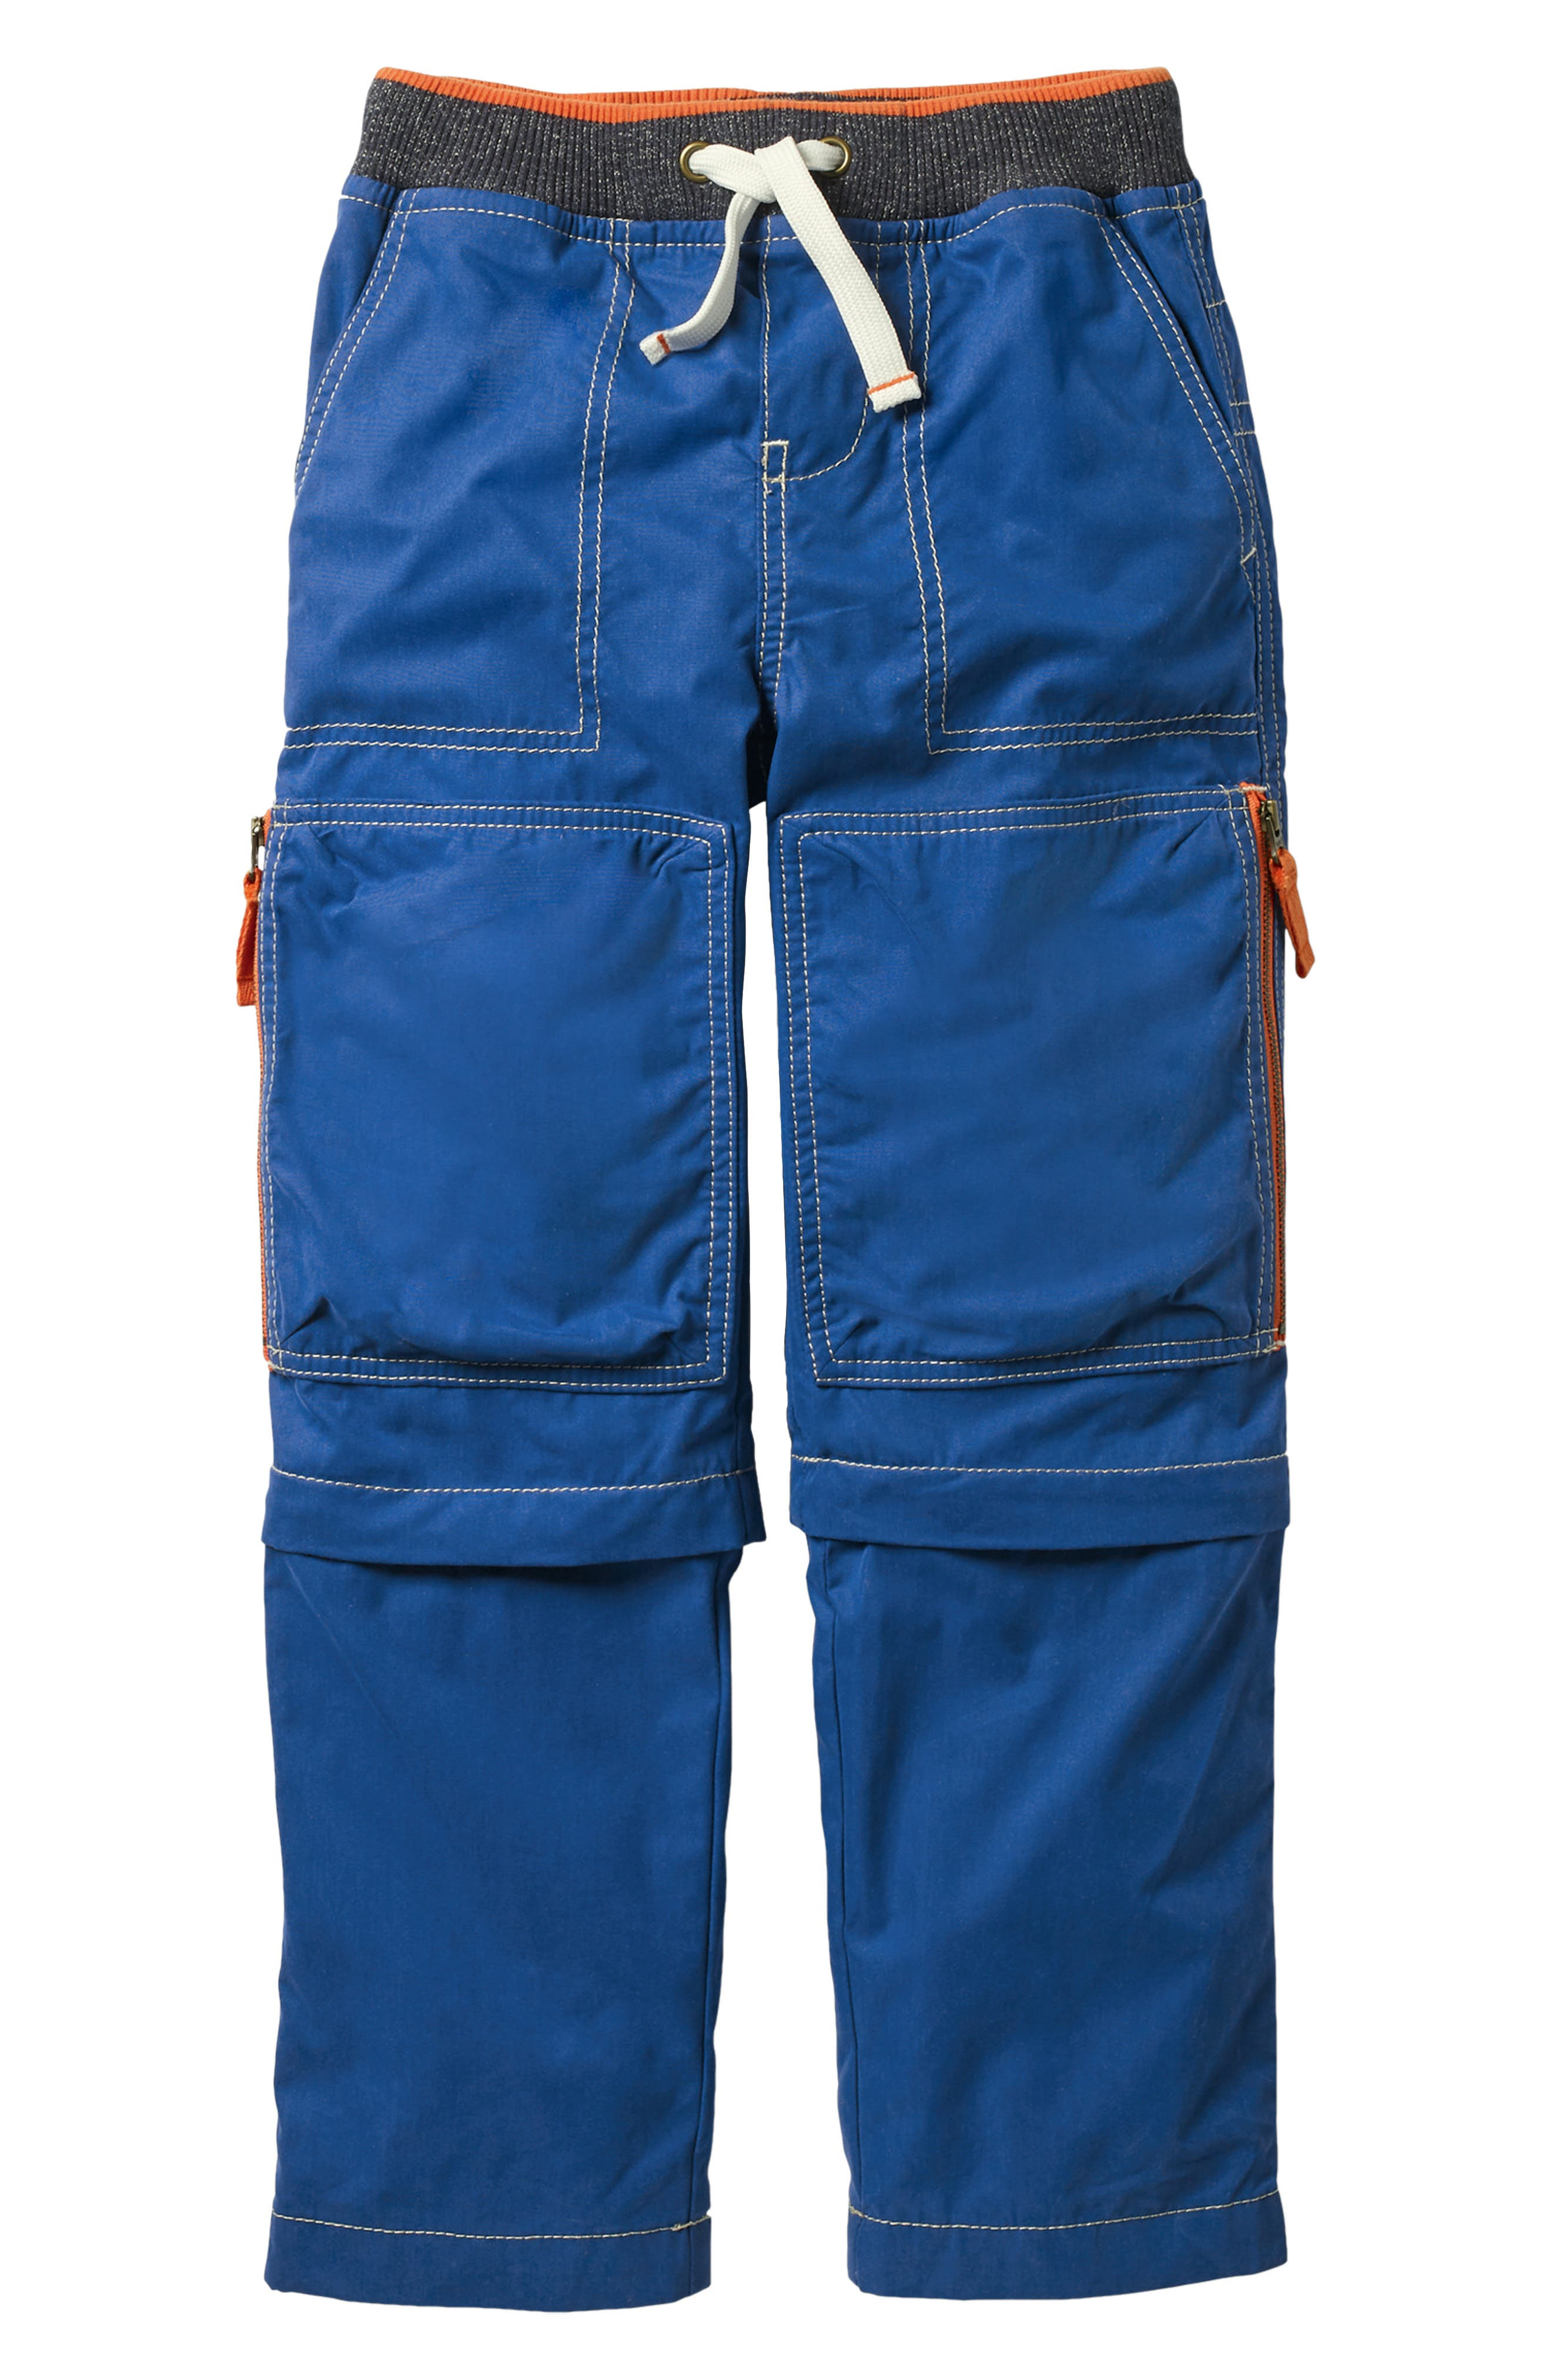 Techno Convertible Zip Off Pants,                             Main thumbnail 1, color,                             Orion Blue